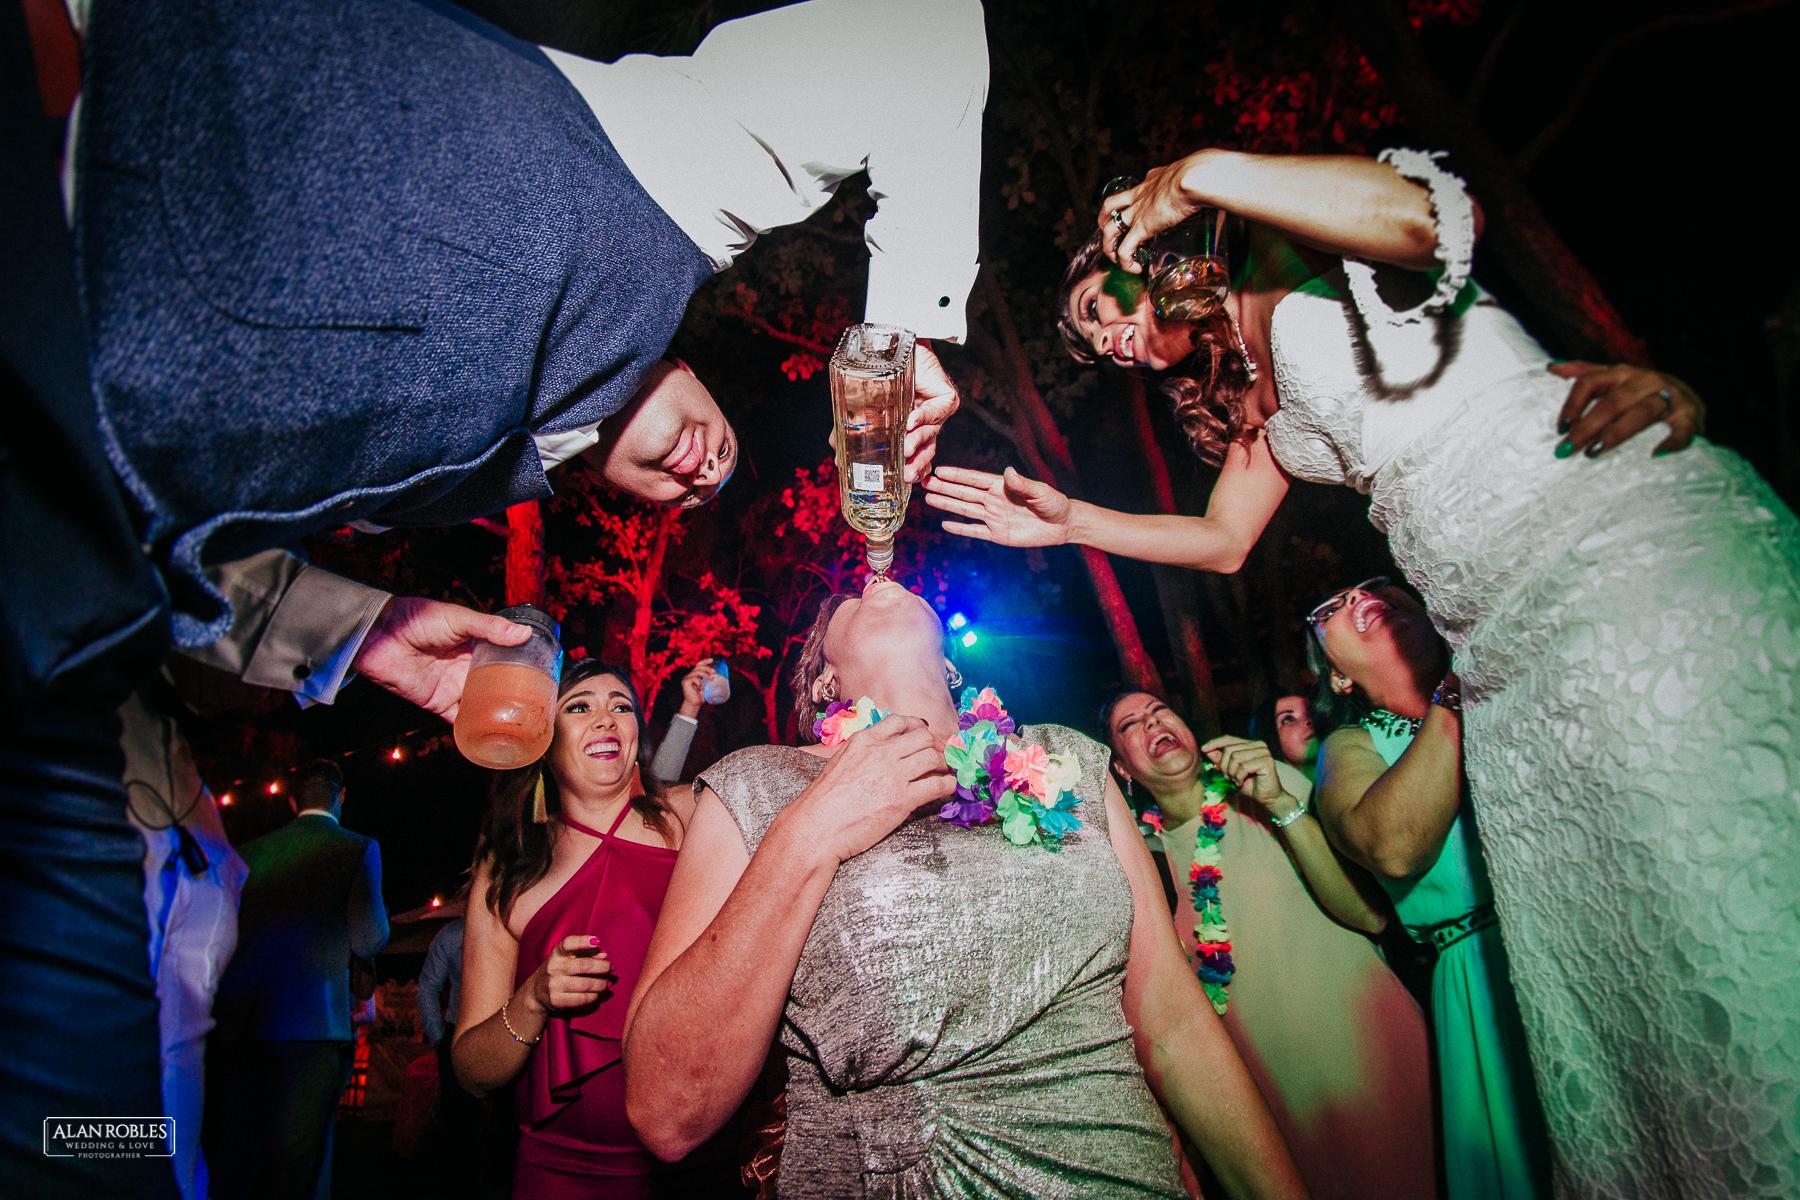 Fotografo de bodas guadalajara Alan Robles - Pinare terraza bistro 74